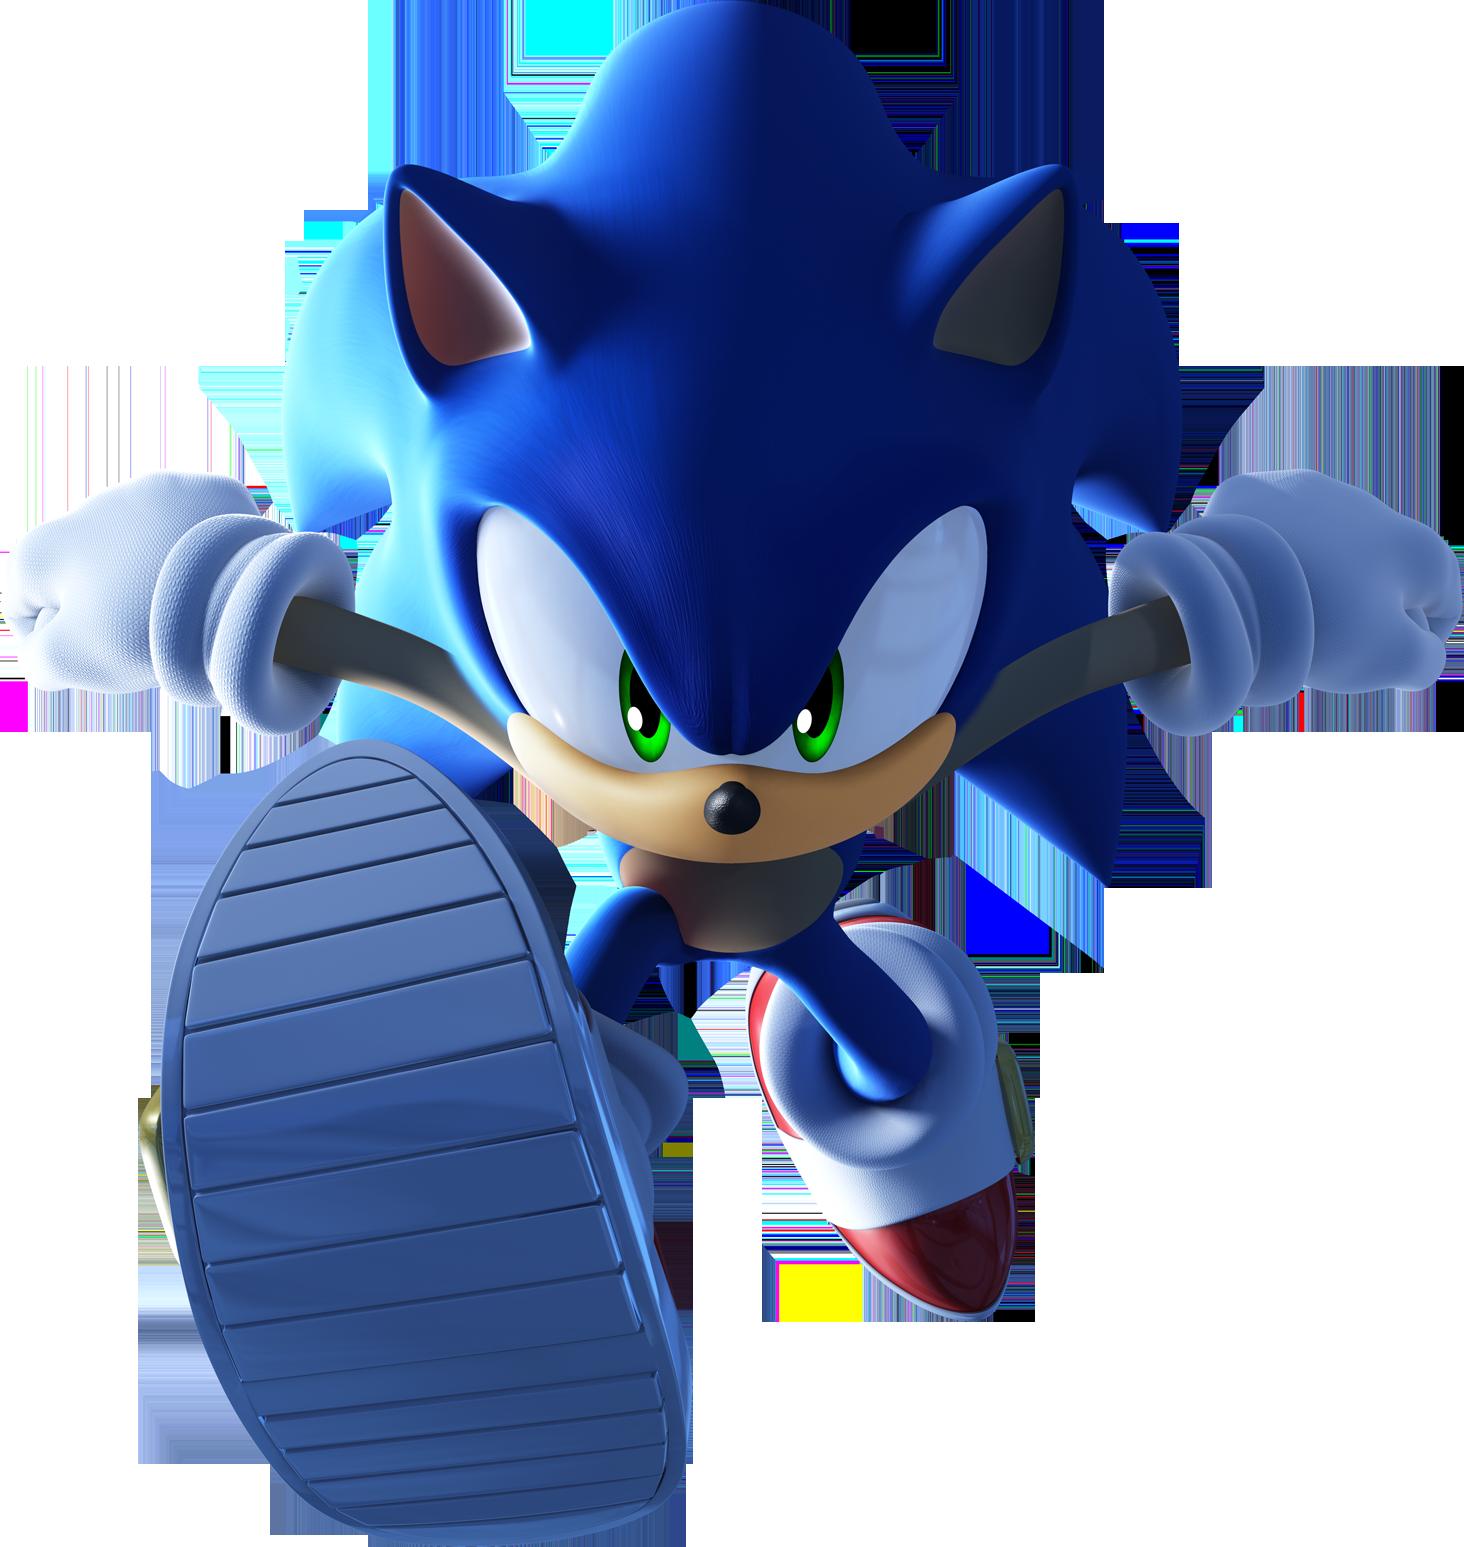 Sonic-Unleashed-Packshot-Pose-Full-Sonic